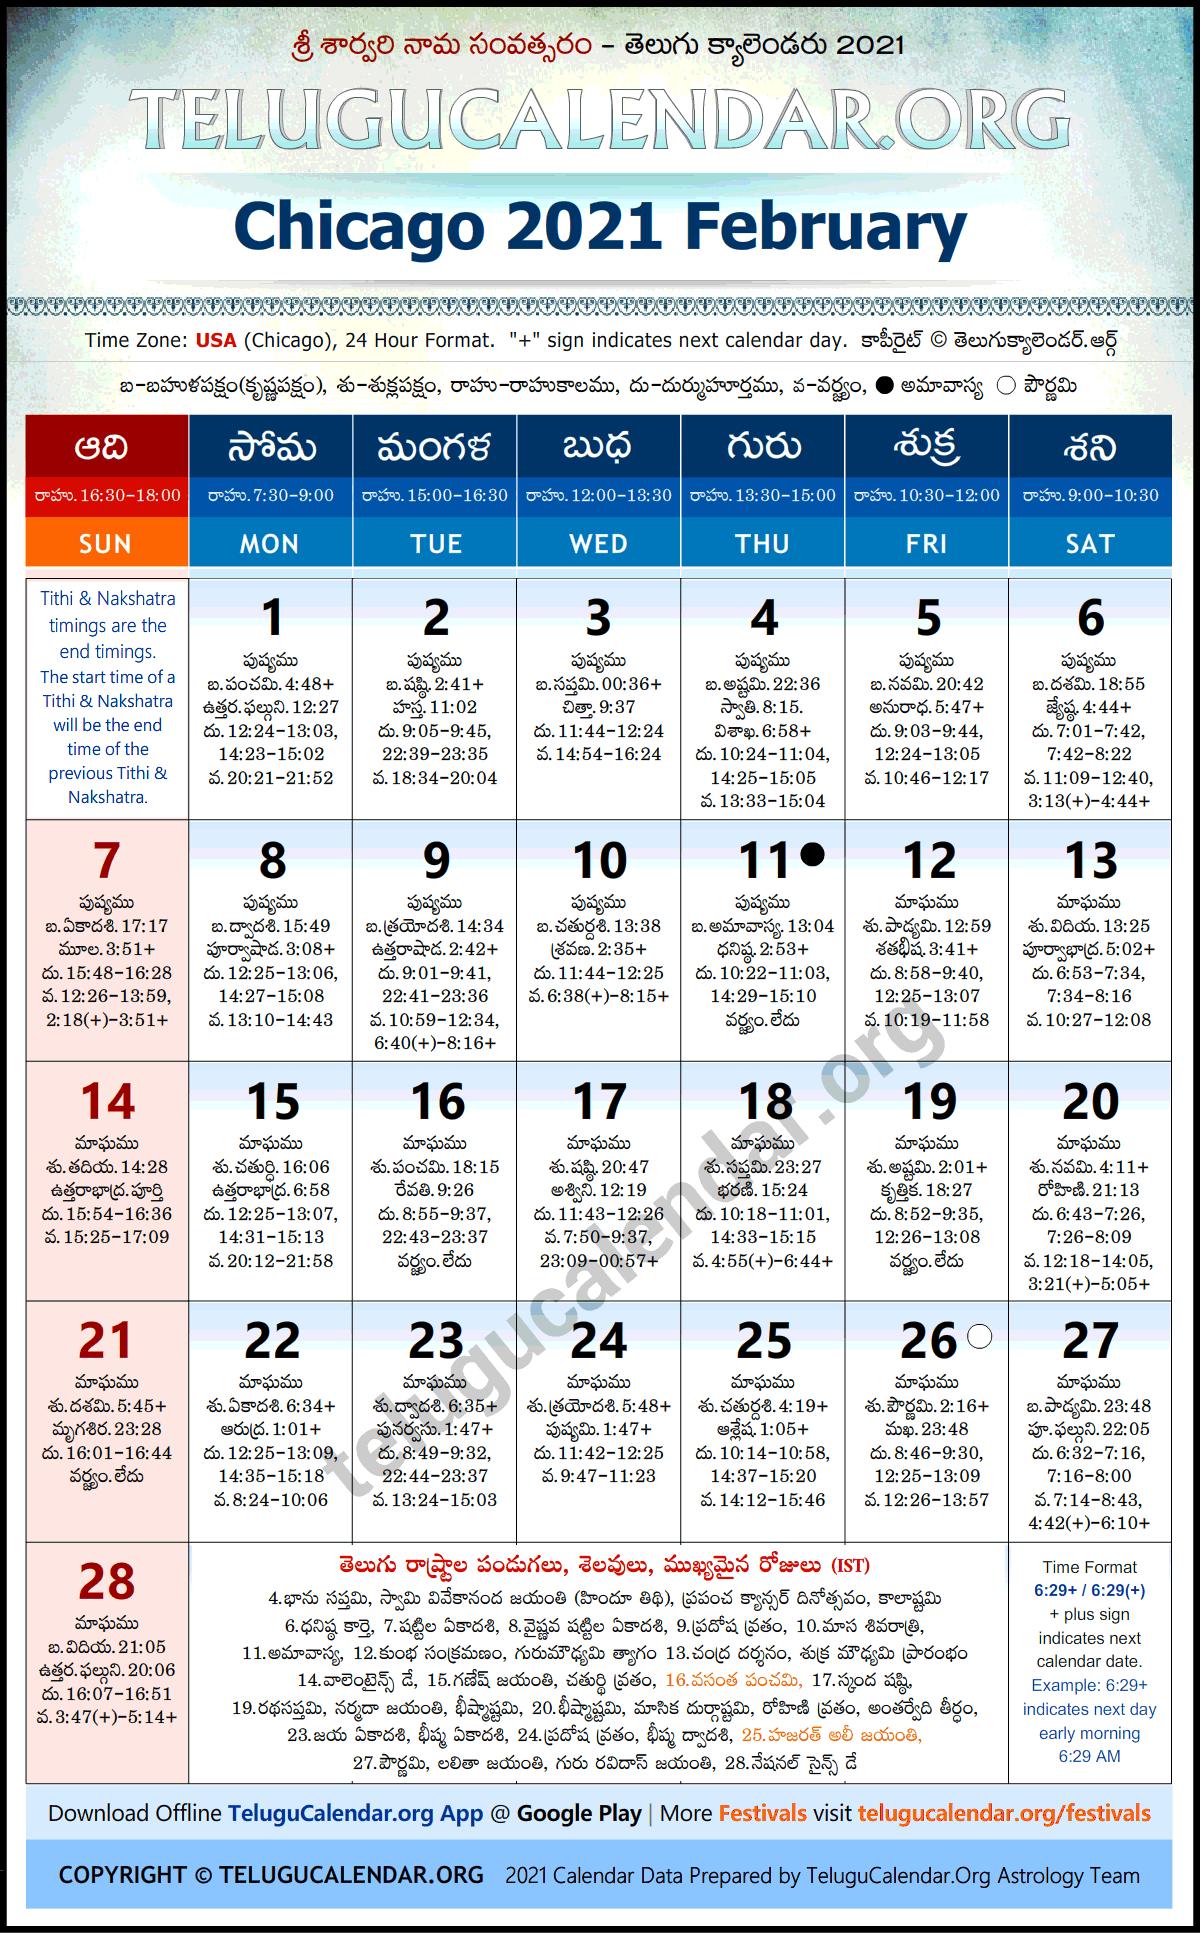 Chicago Telugu Calendar 2022.Chicago Telugu Calendar 2021 February Festivals Holidays Ist